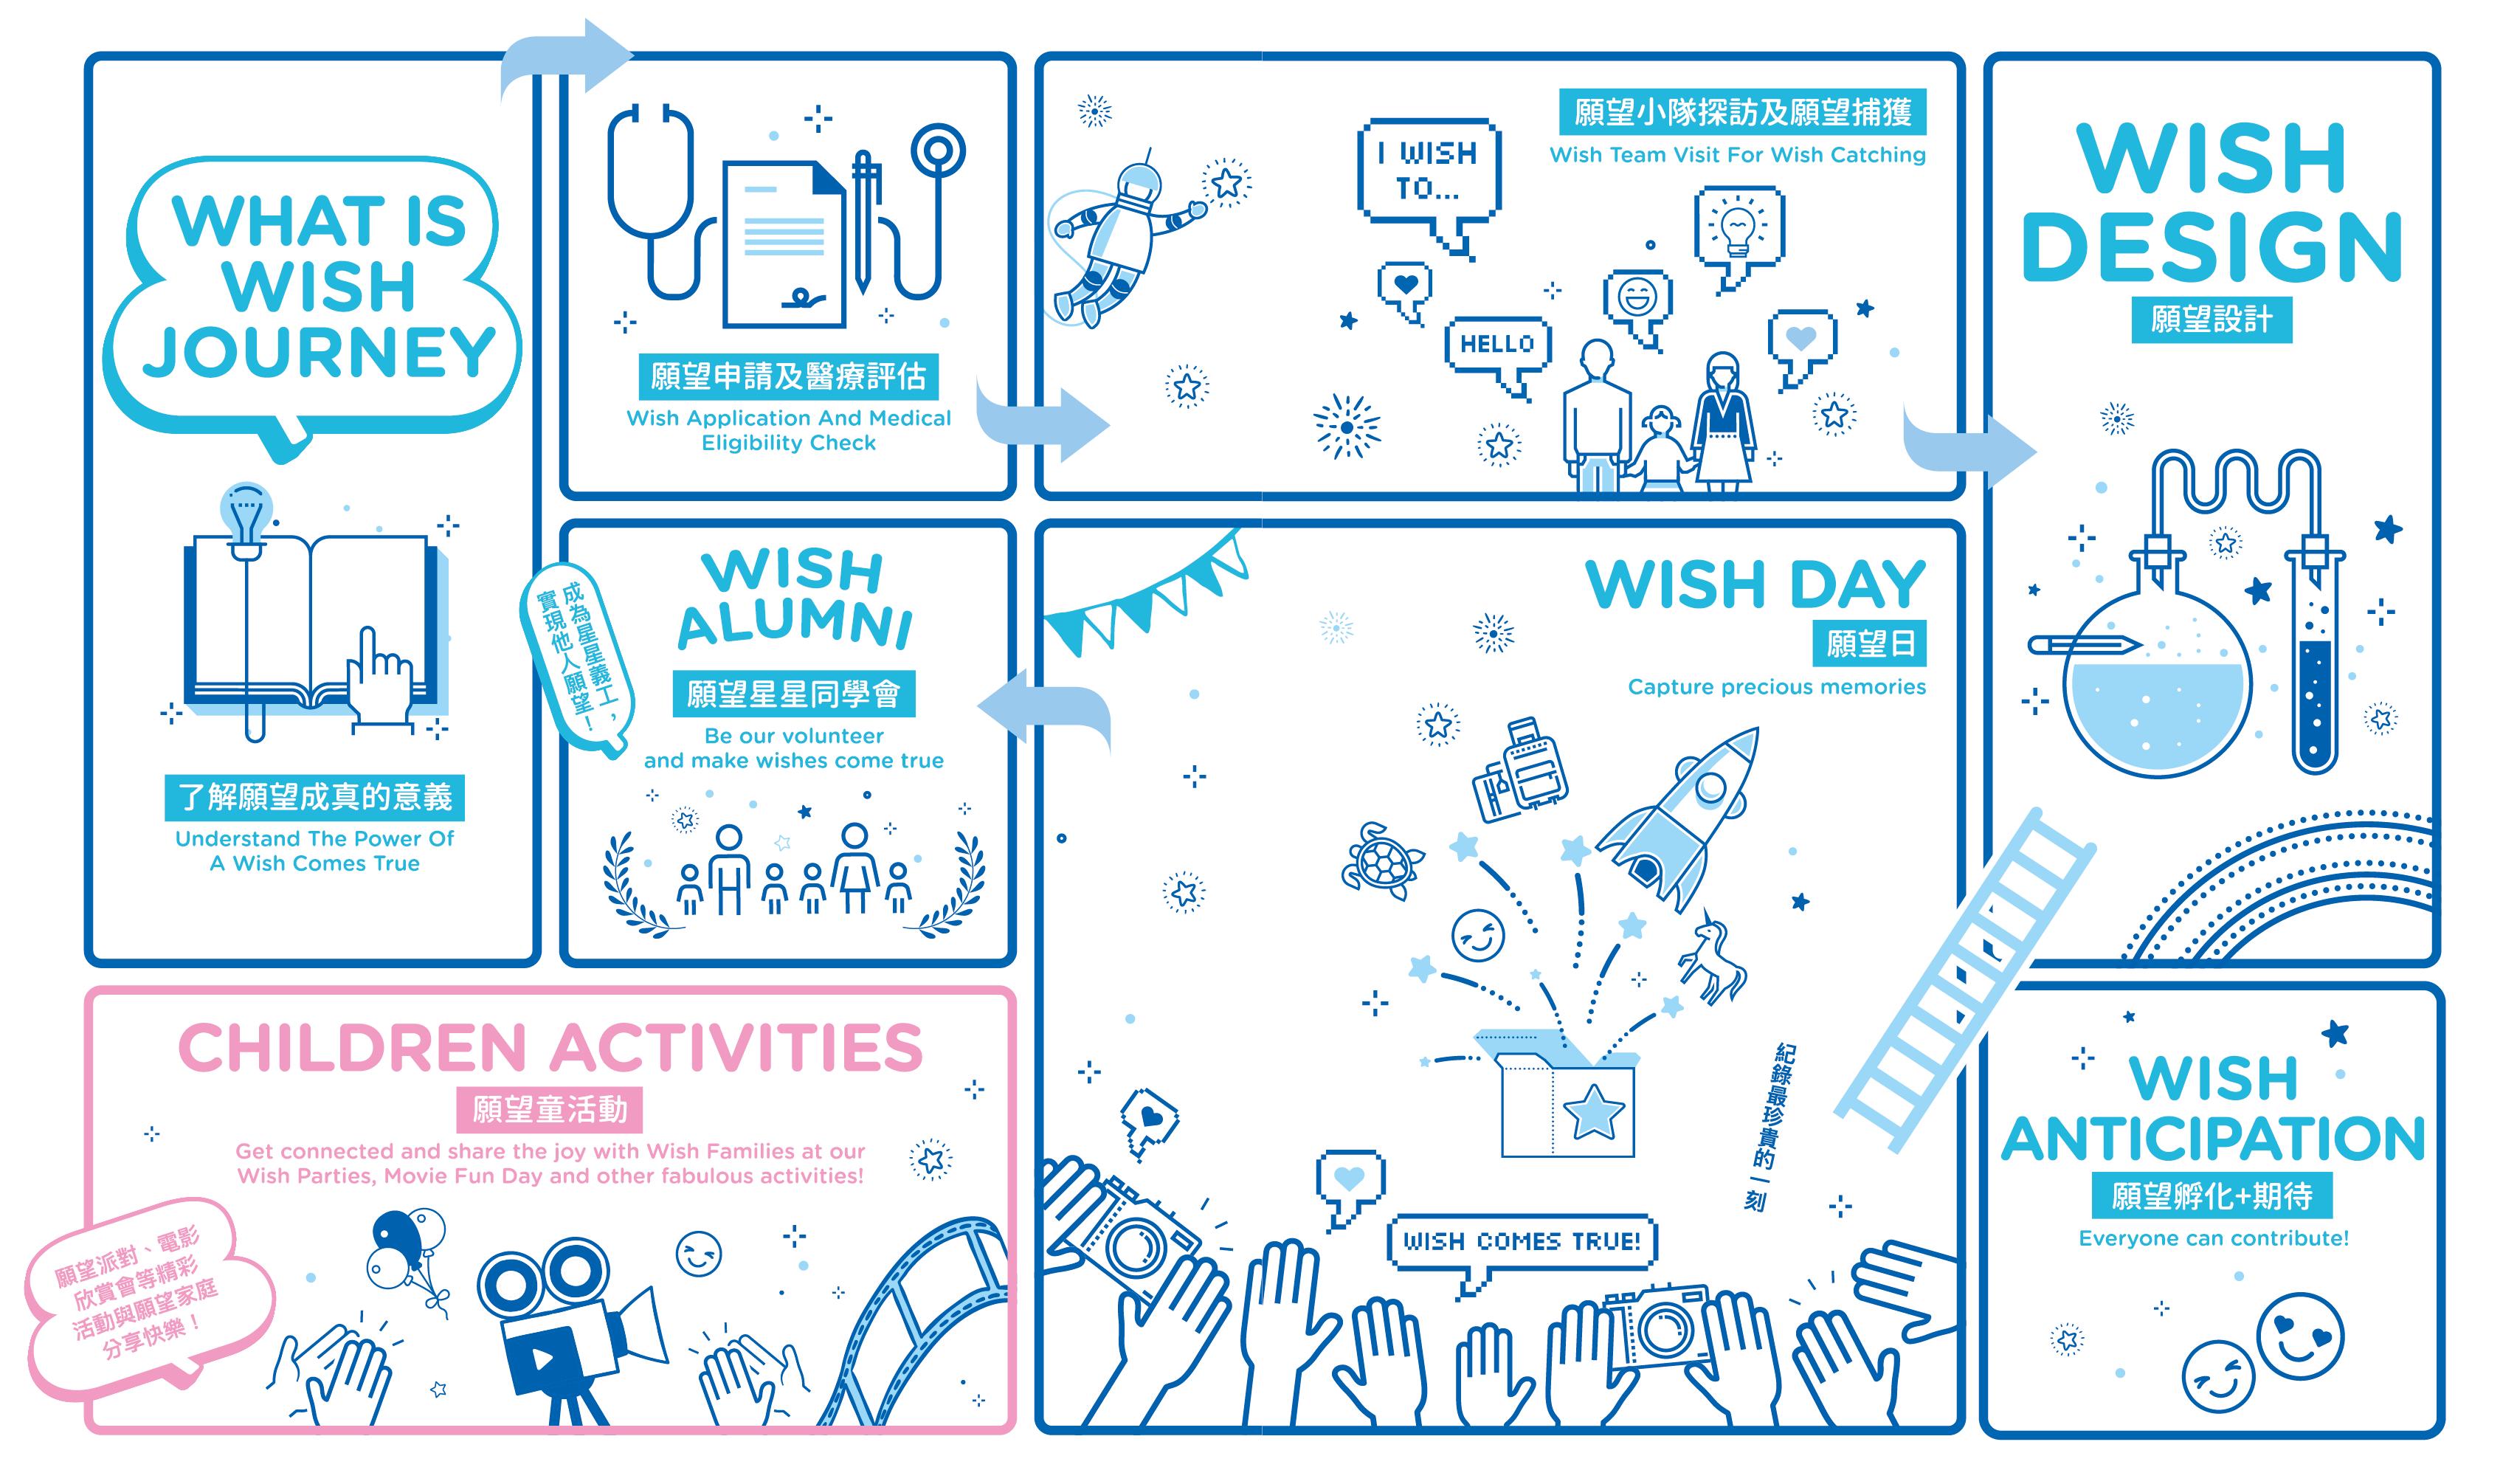 wish-journey-02-02